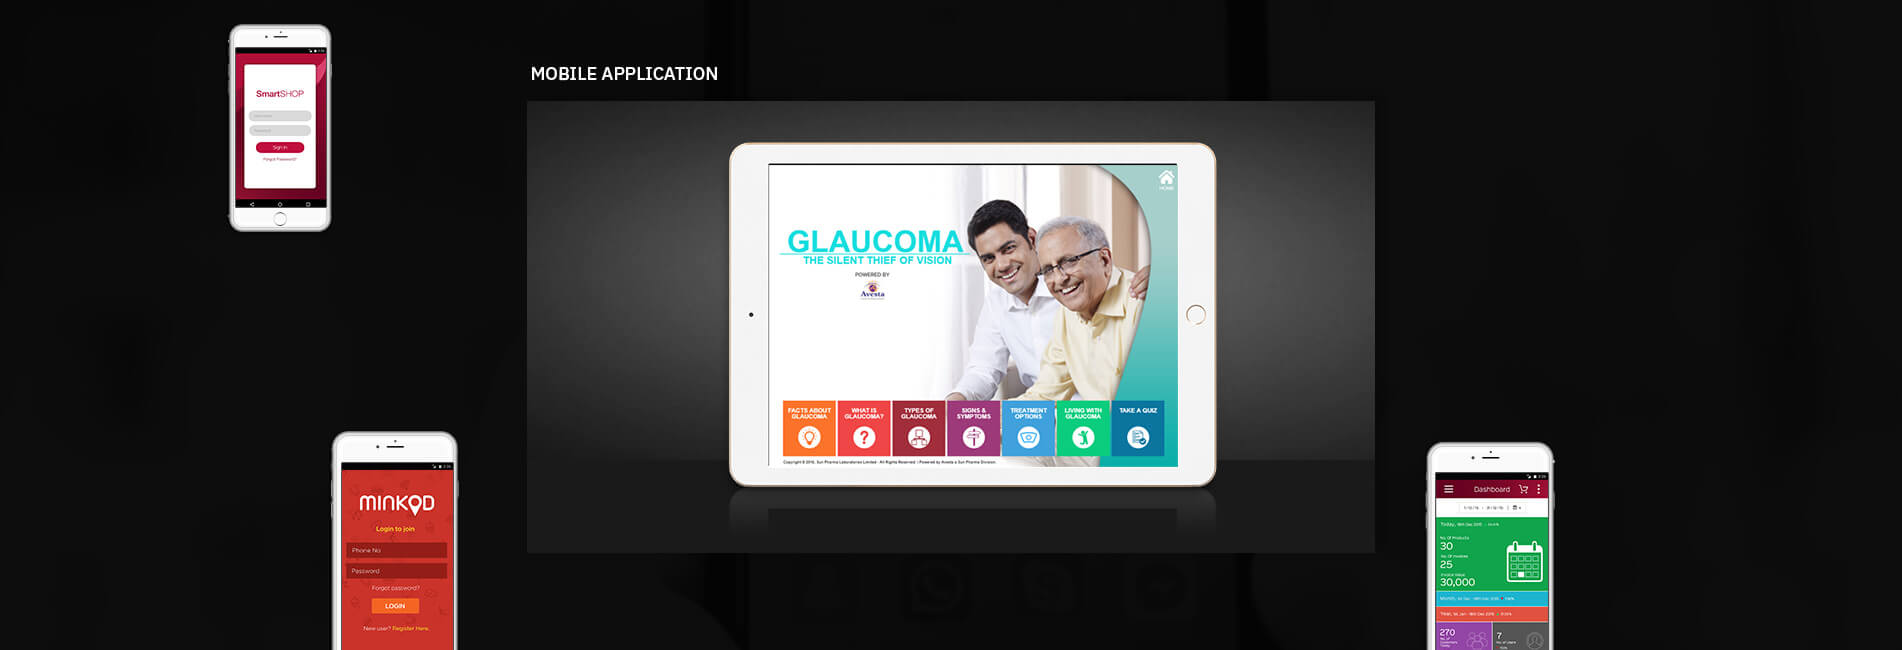 Mobile Application Design Company